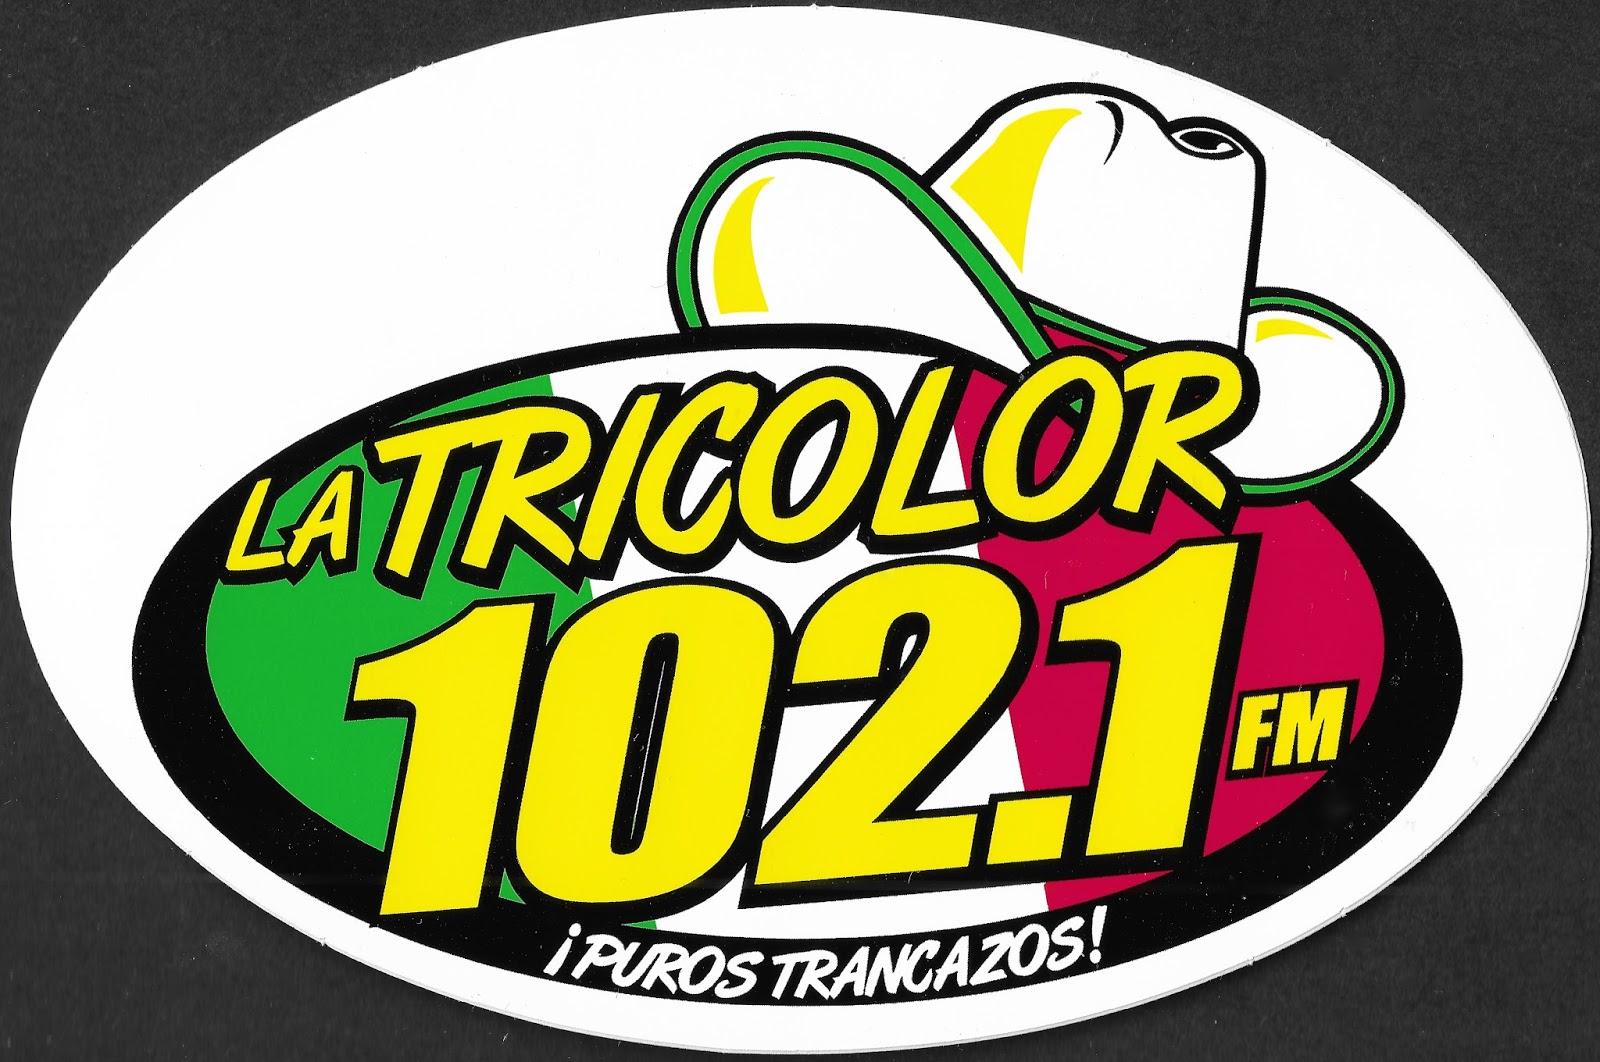 Radio Sticker of the Day: February 2018